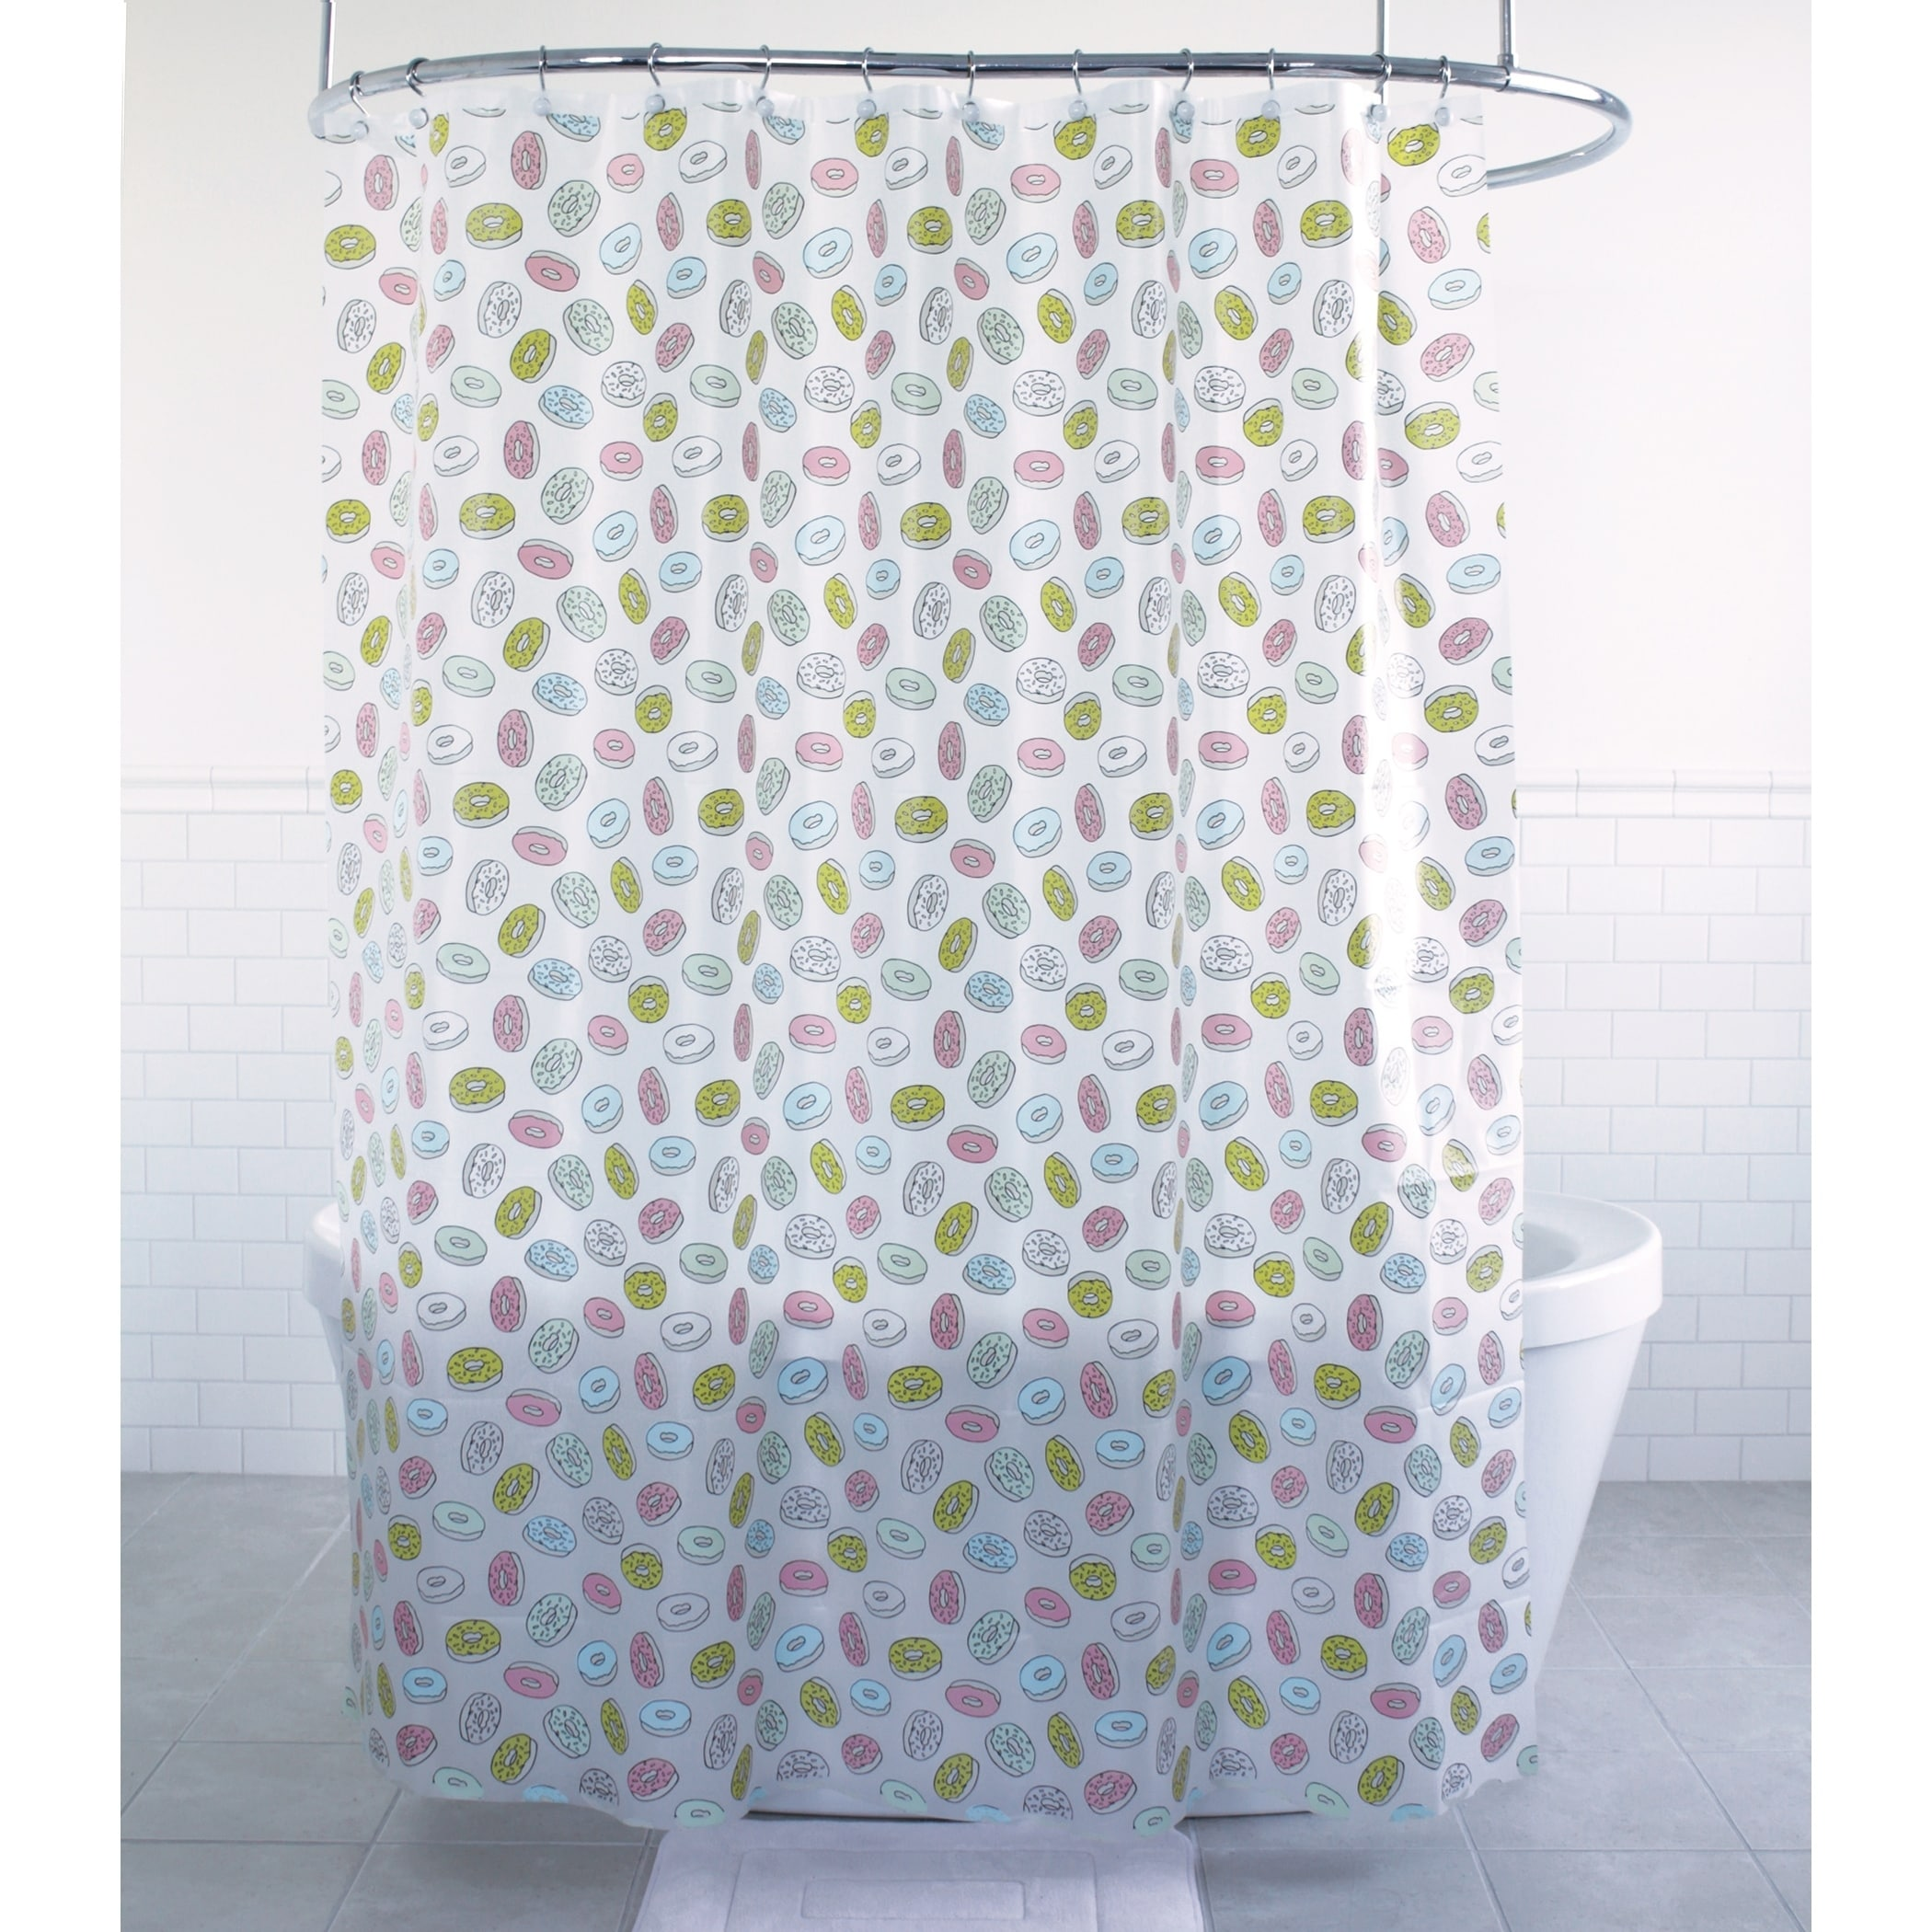 Splash Home Delights Donuts Peva Shower Curtain 70 X 7 Inch